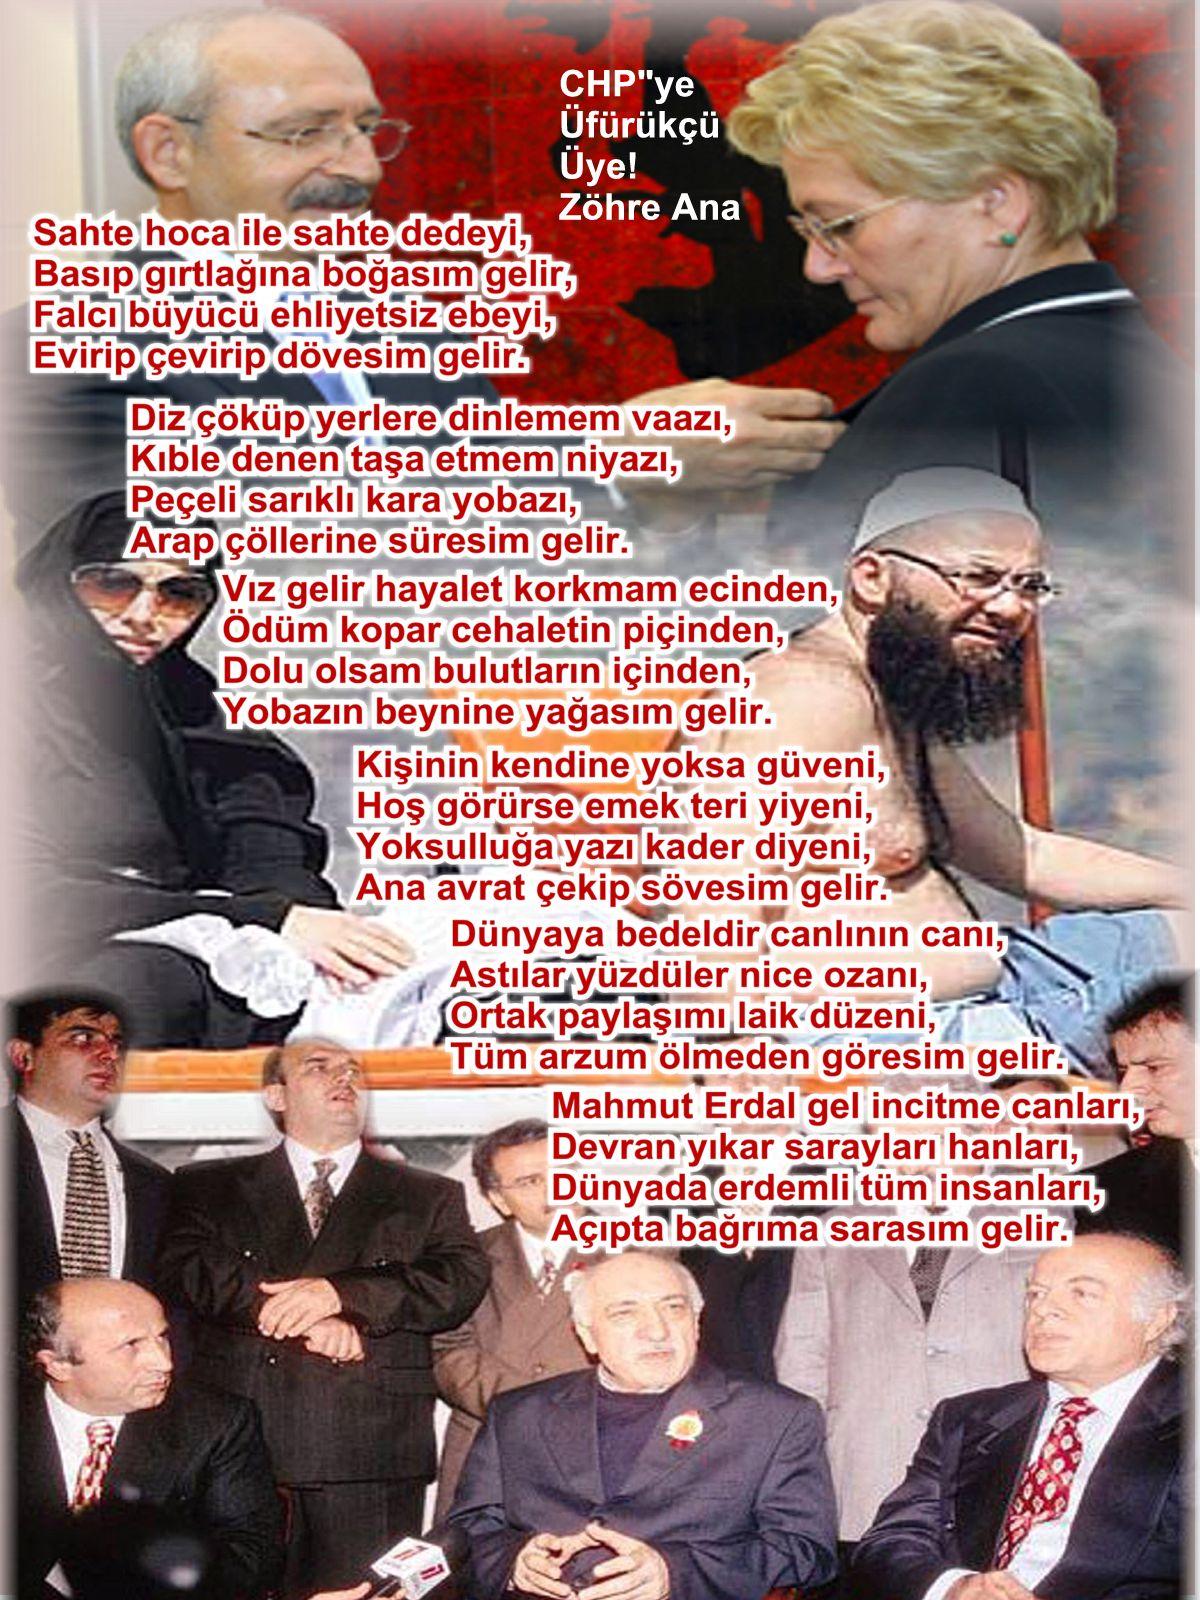 Devrimci Aleviler Birliği DAB Alevi Kızılbaş Bektaşi pir sultan cem hz Ali 12 imam semah Feramuz Şah Acar sahtehoca dede